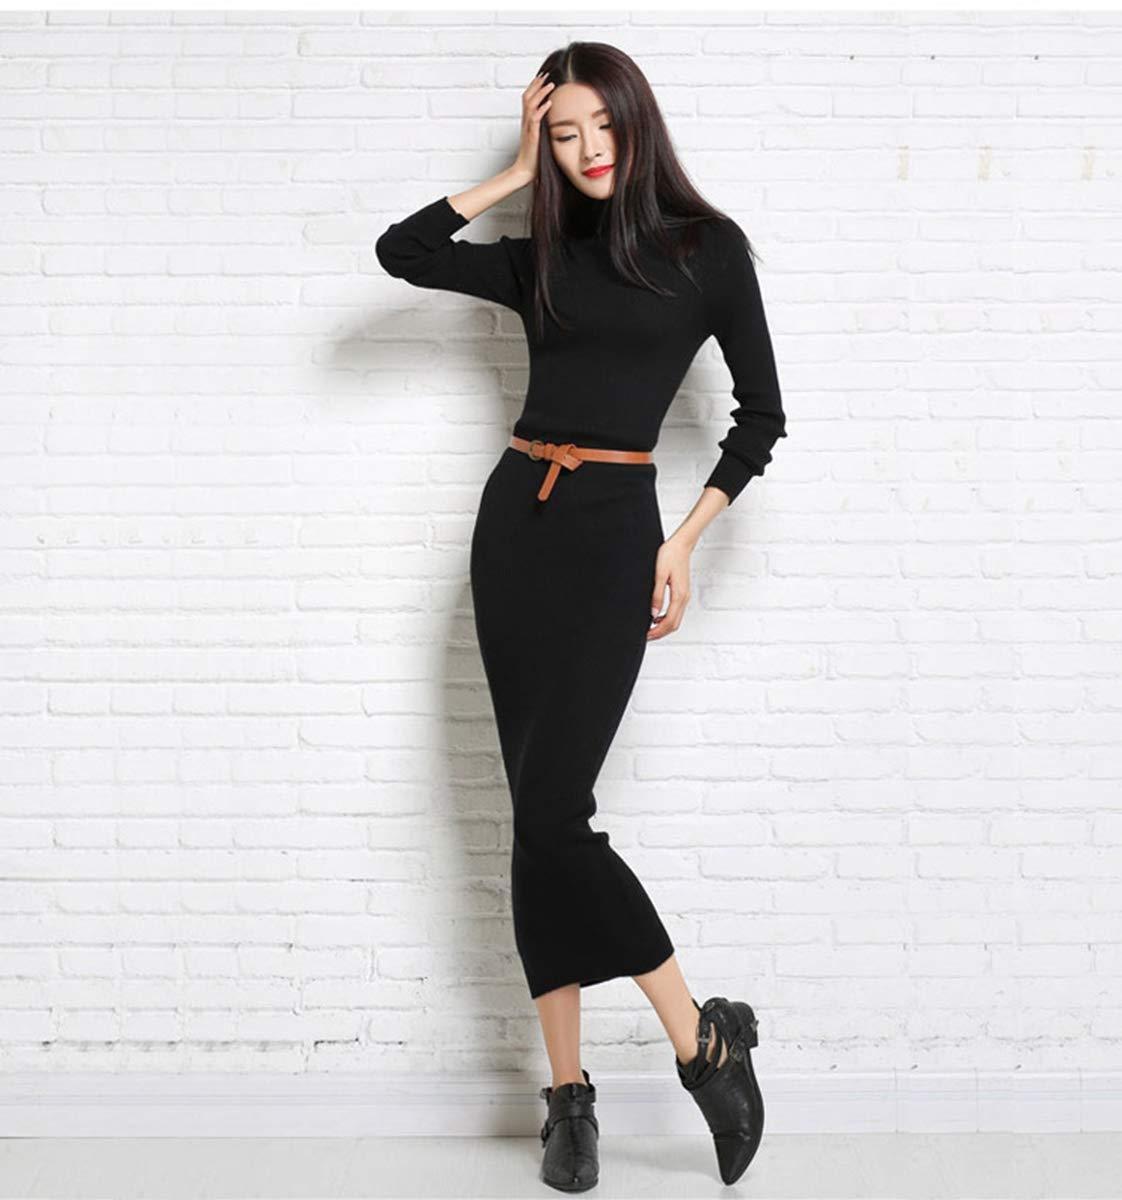 Dresses Women\'s Maxi Dress Turtleneck Cashmere ankle length dress Long Sleeve Slim Fit Stretchable Elasticity (One Size, 1325 Black)